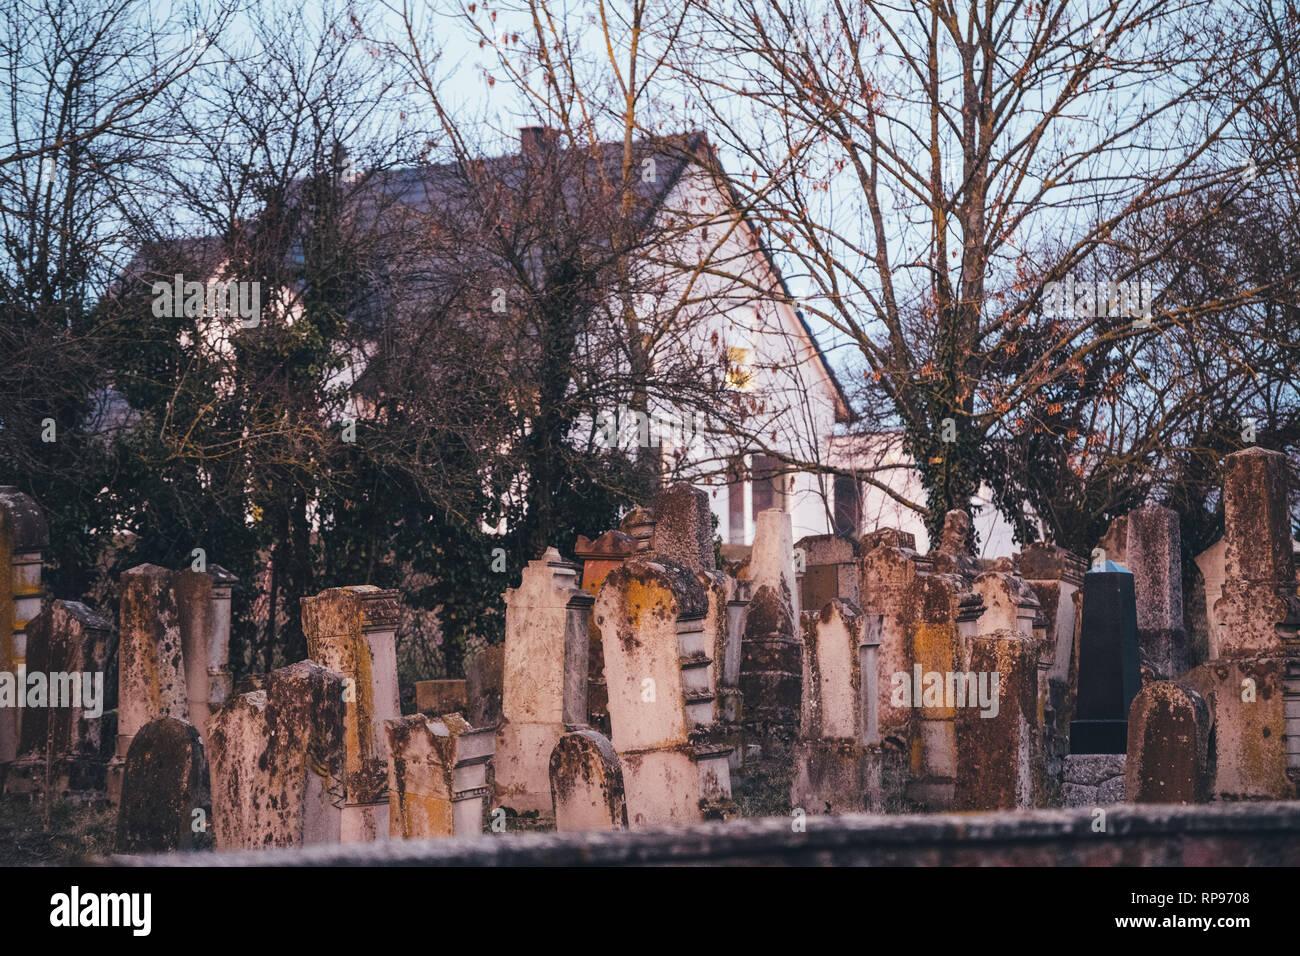 Jewish cemetery in Quatzenheim near Strasbourg, Alsace, France - street view  - Stock Image